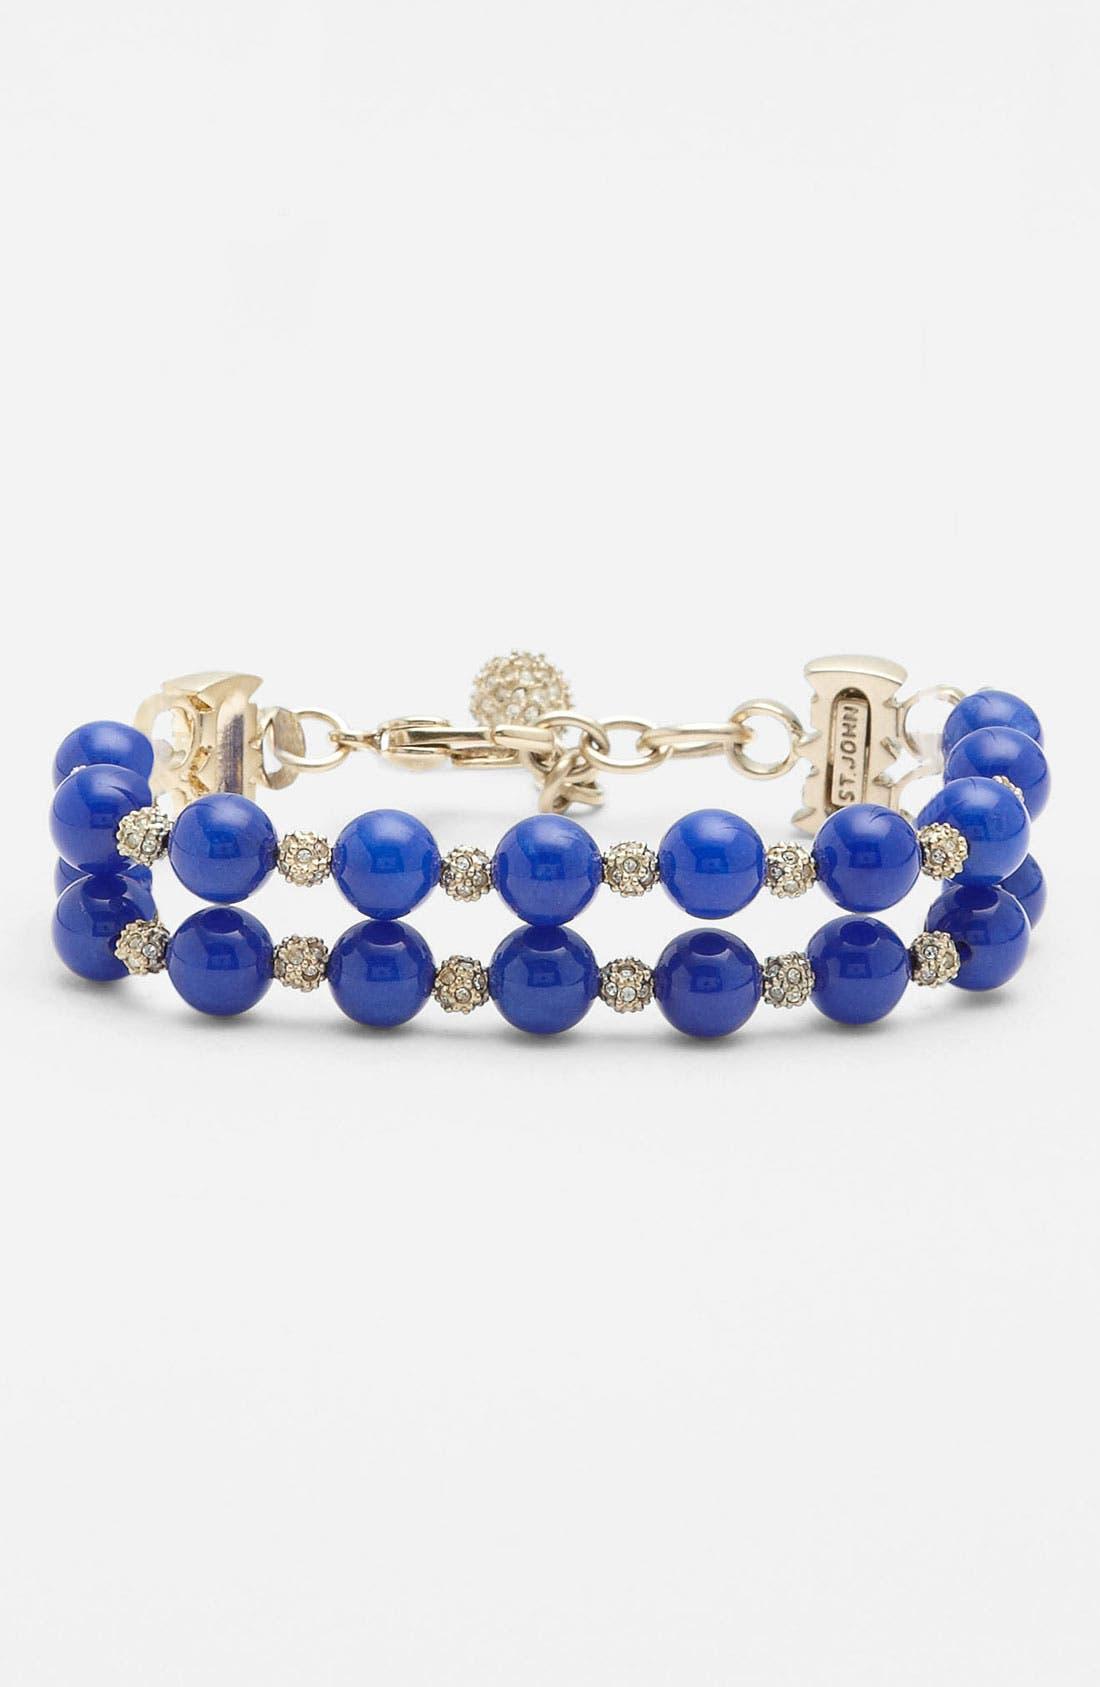 Main Image - St. John Collection Dyed Quartz Double Strand Bracelet